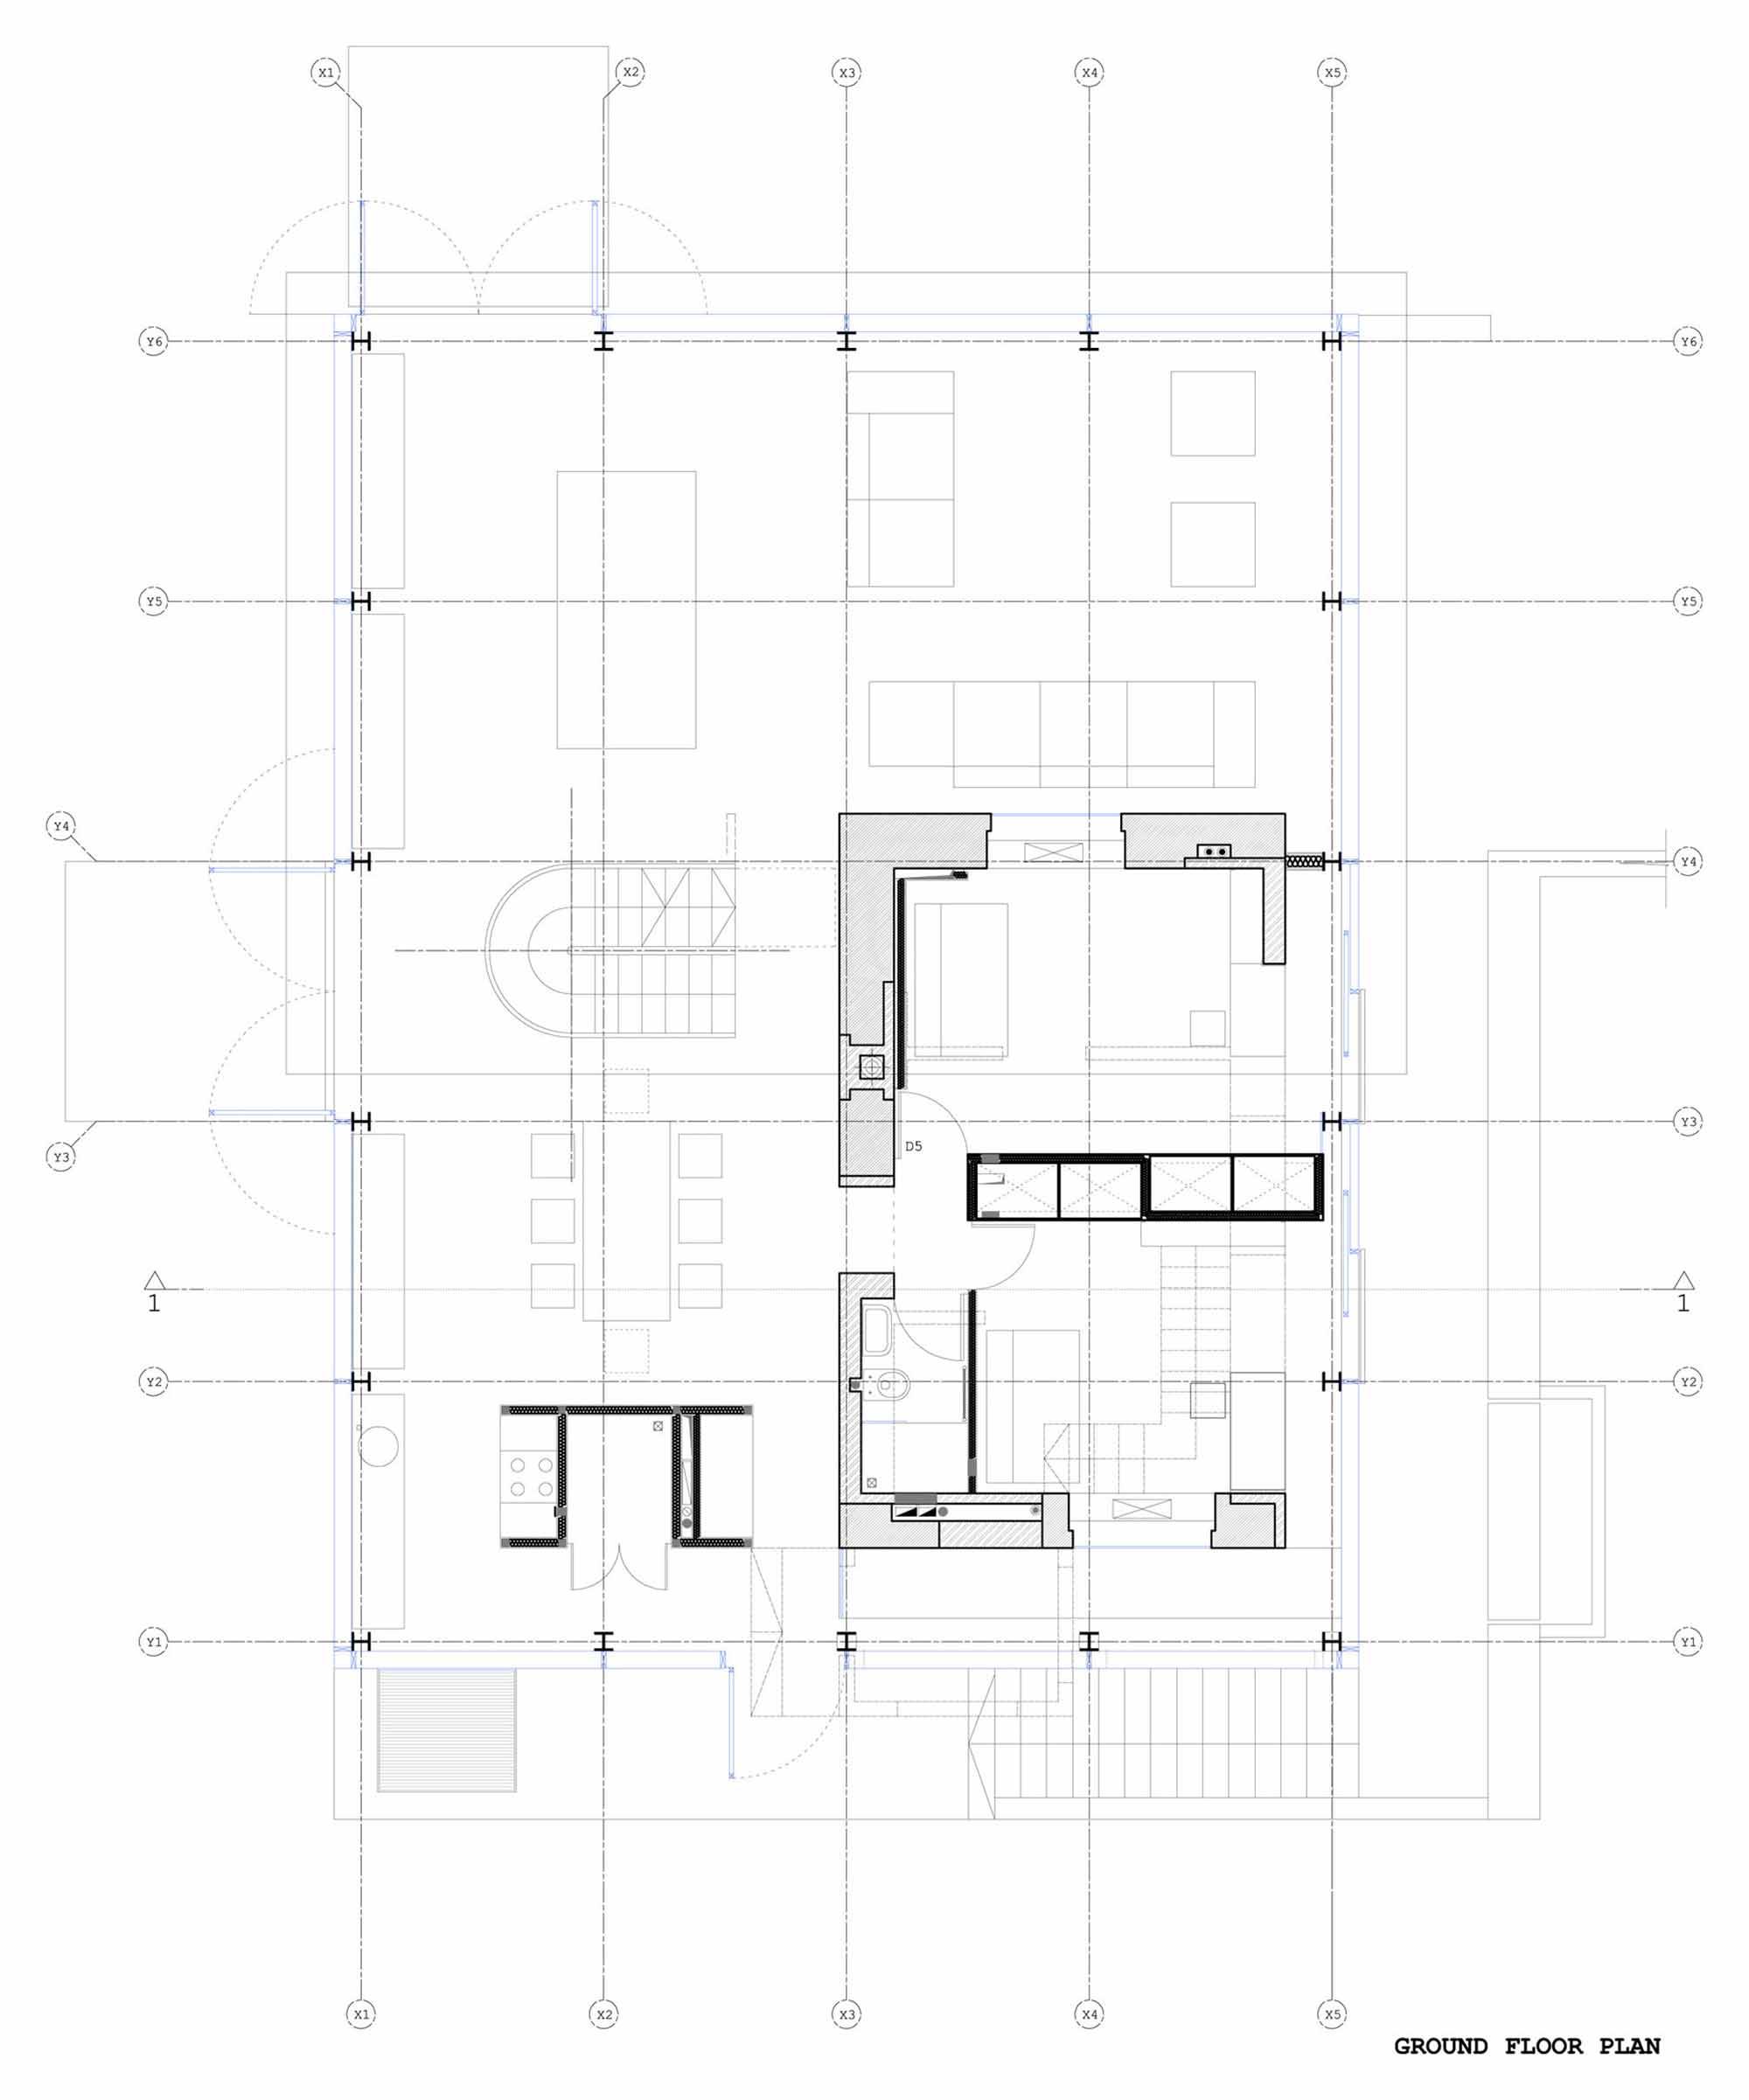 Ground Floor Plan, Glass House, Vilnius, Lithuania